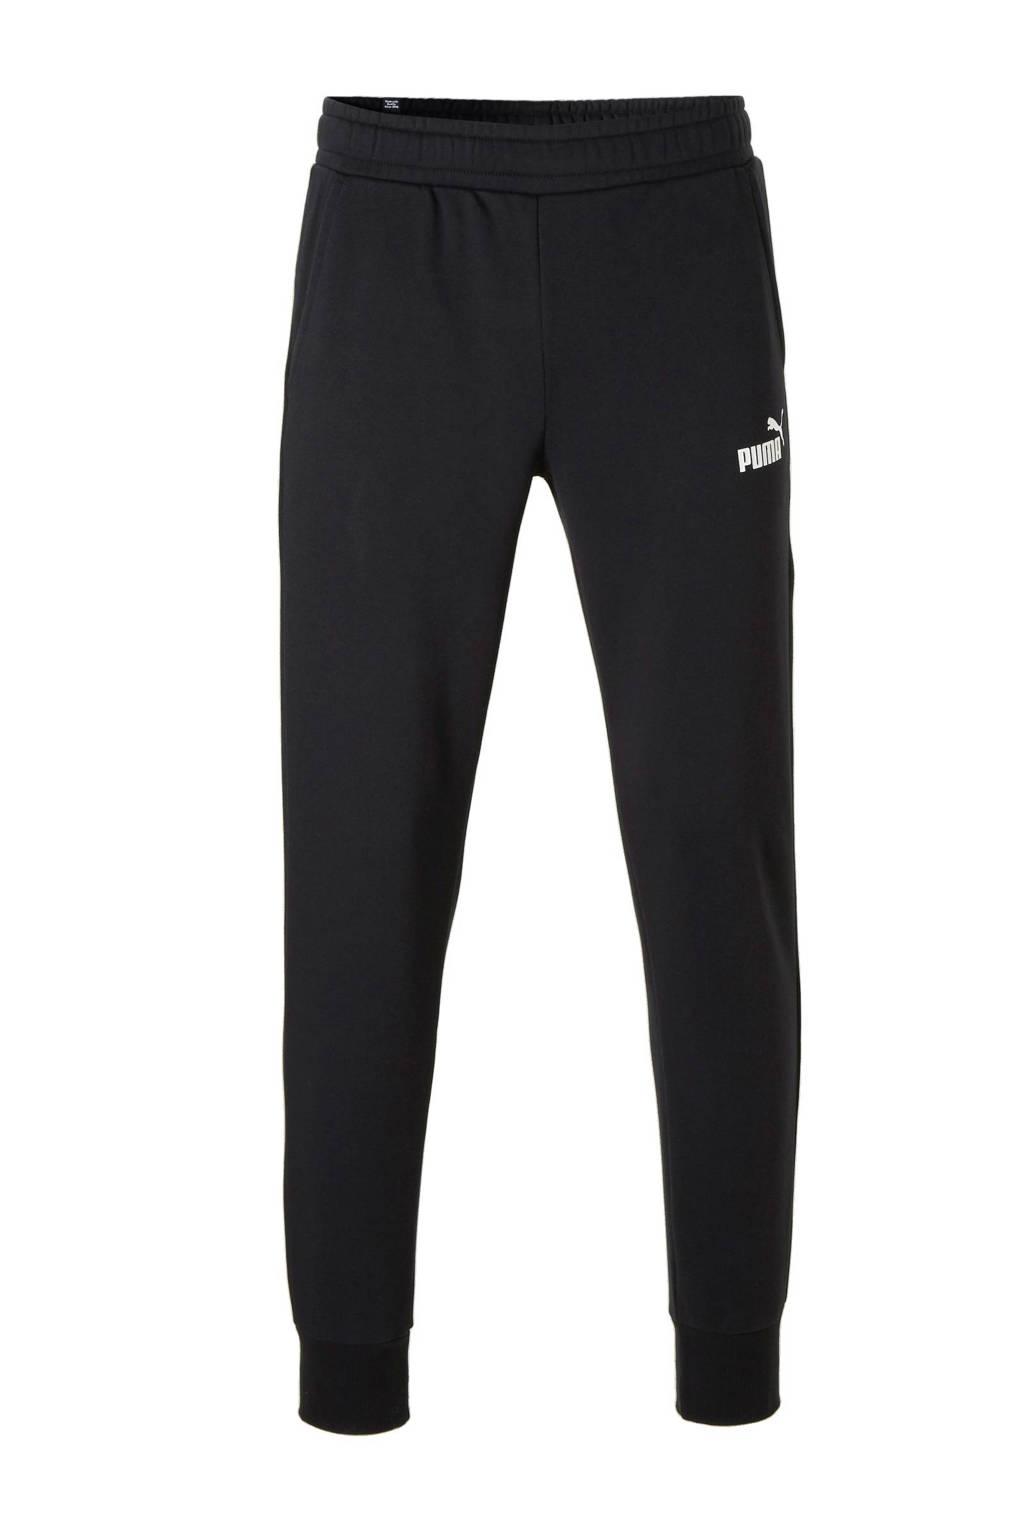 Puma 7/8 joggingbroek, Zwart/wit